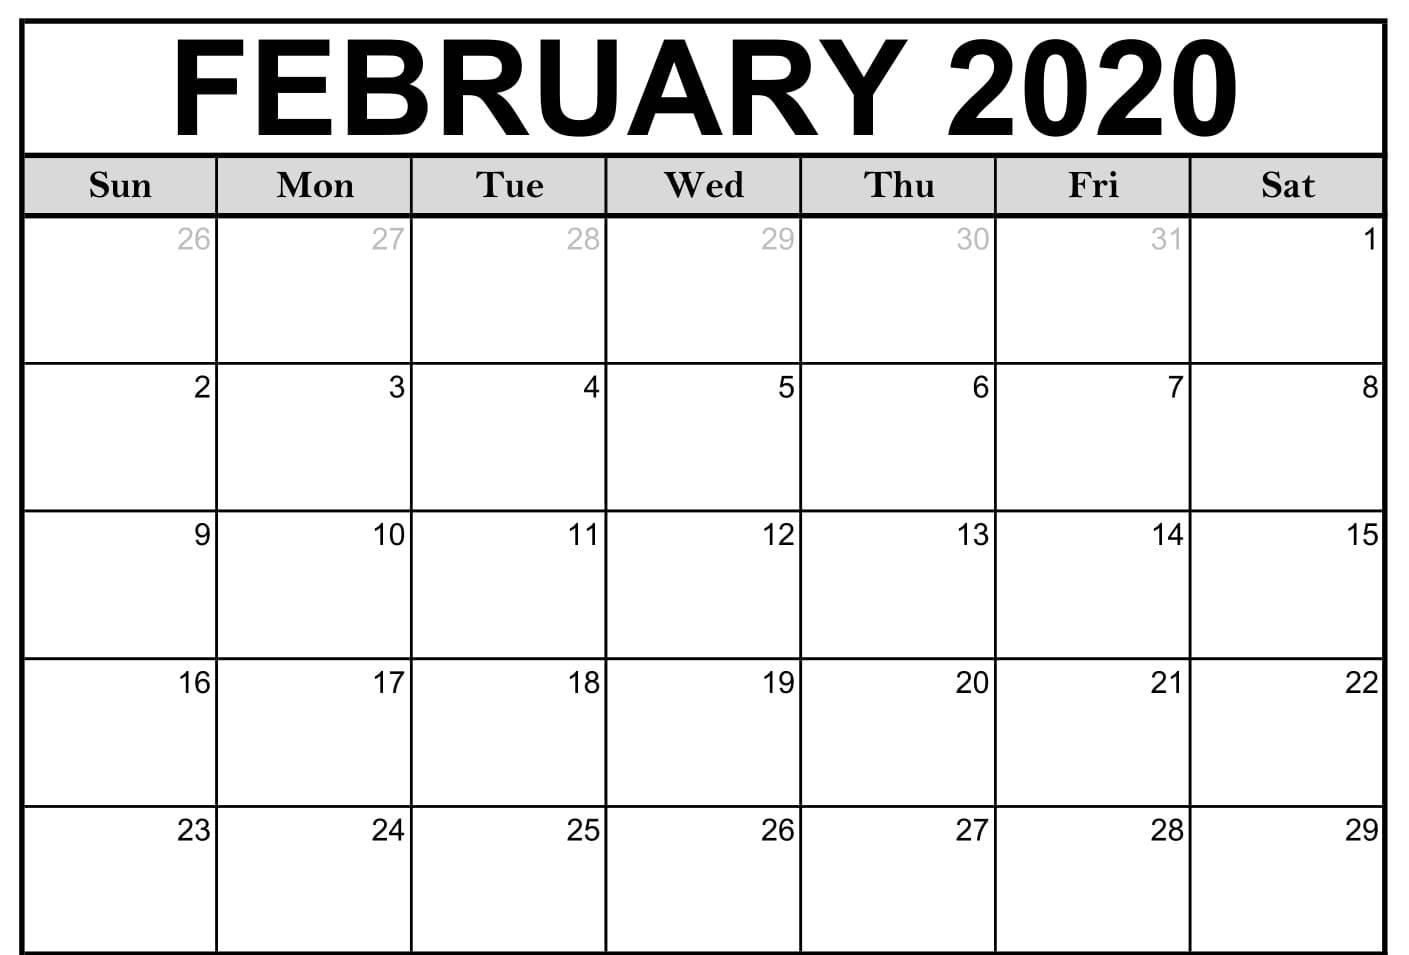 Monthly February 2020 Calendar